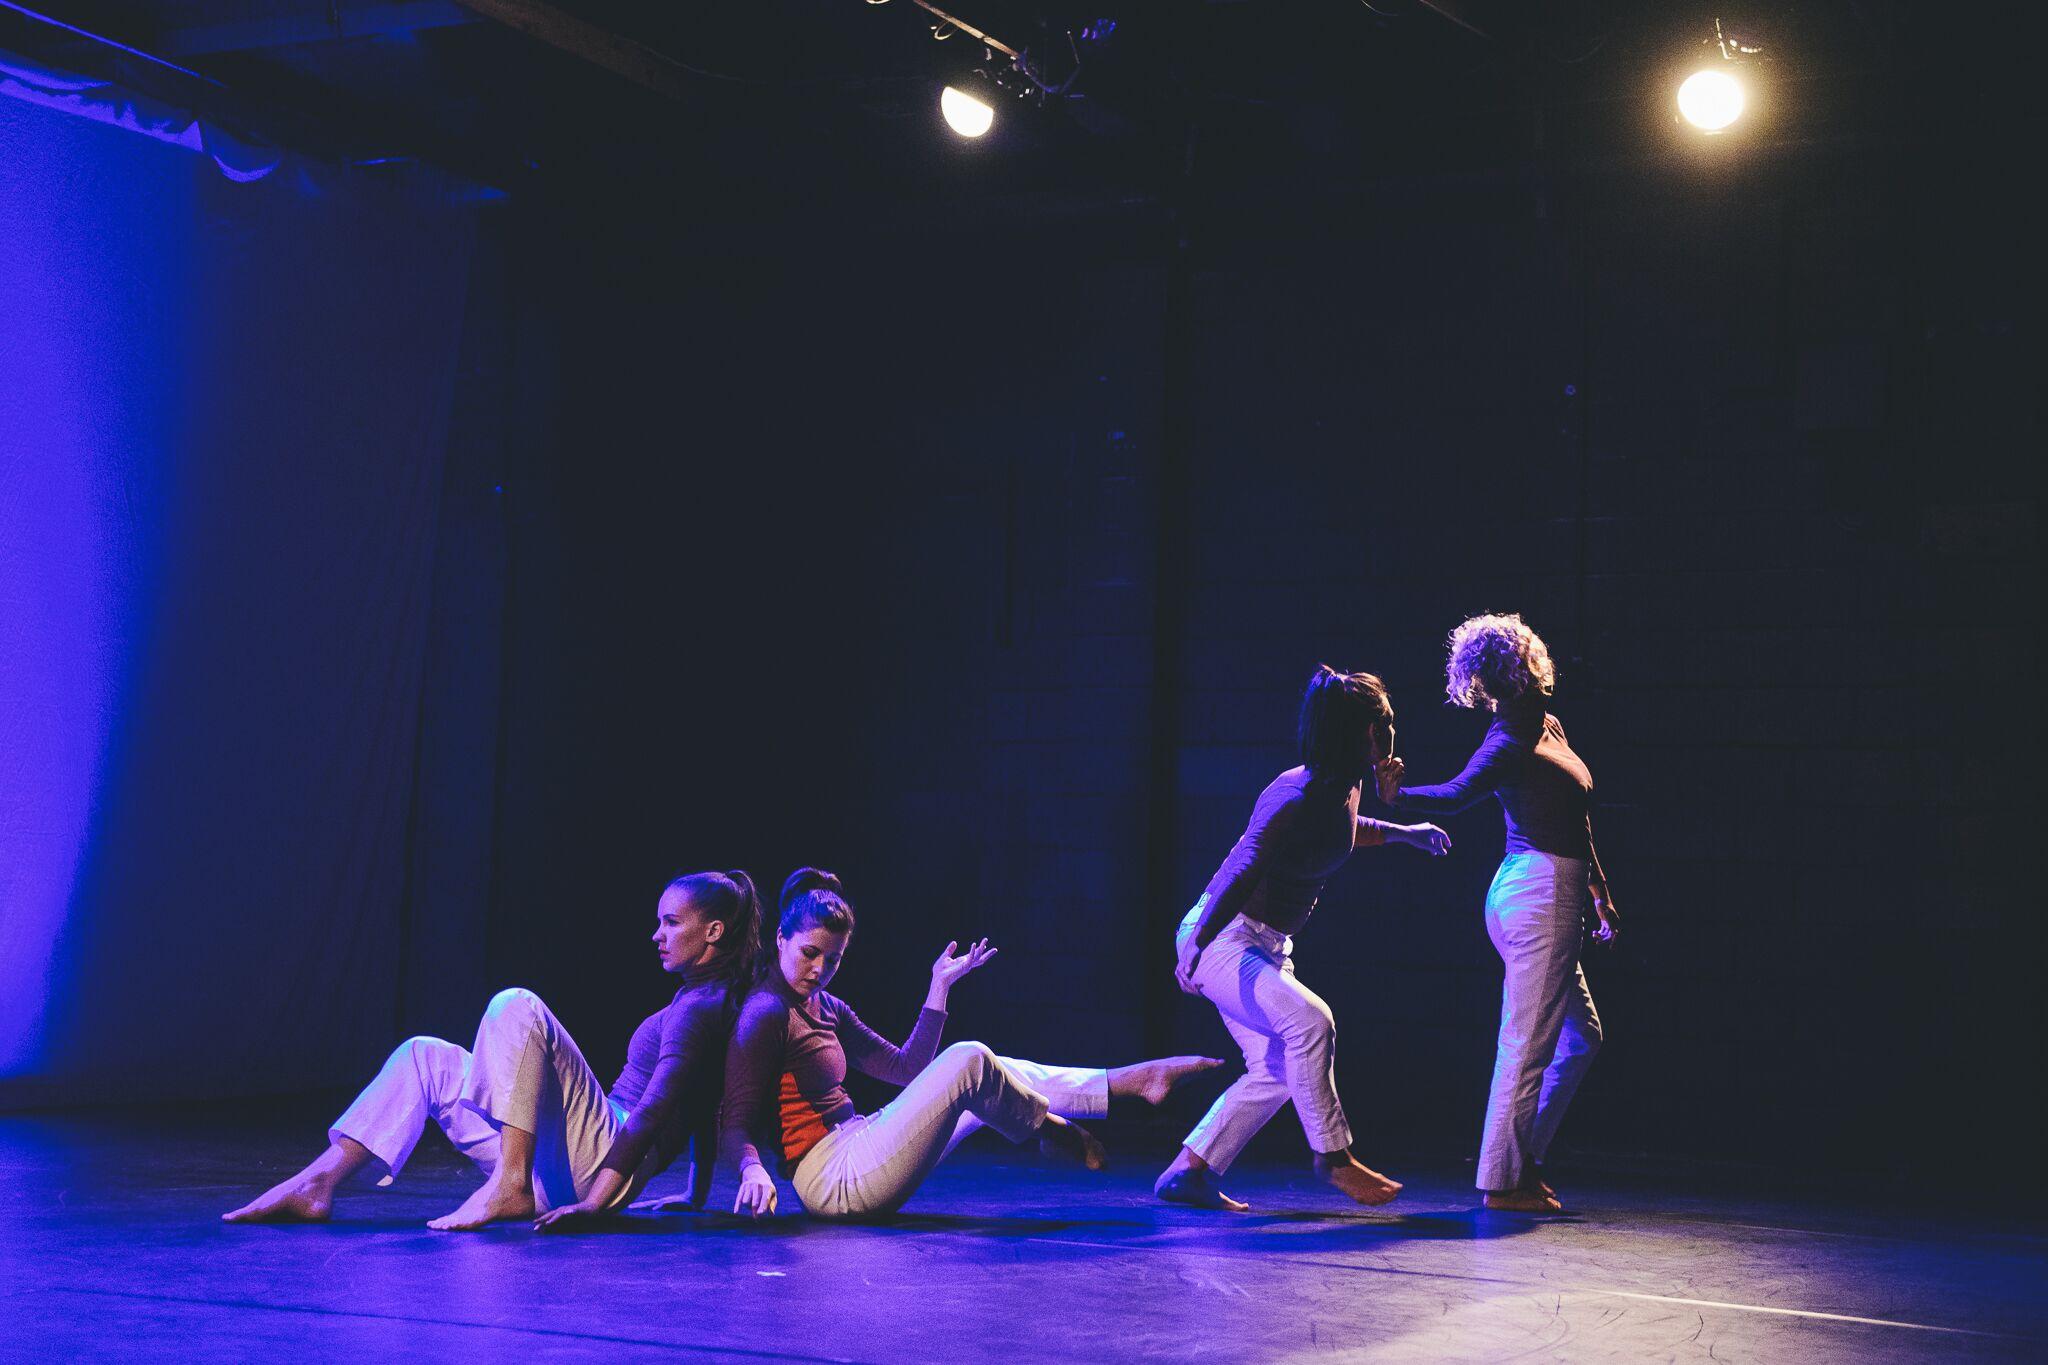 Dancers: Lucy Wilson, Taryn Lavery, Alex Miller, Hailley Laurèn